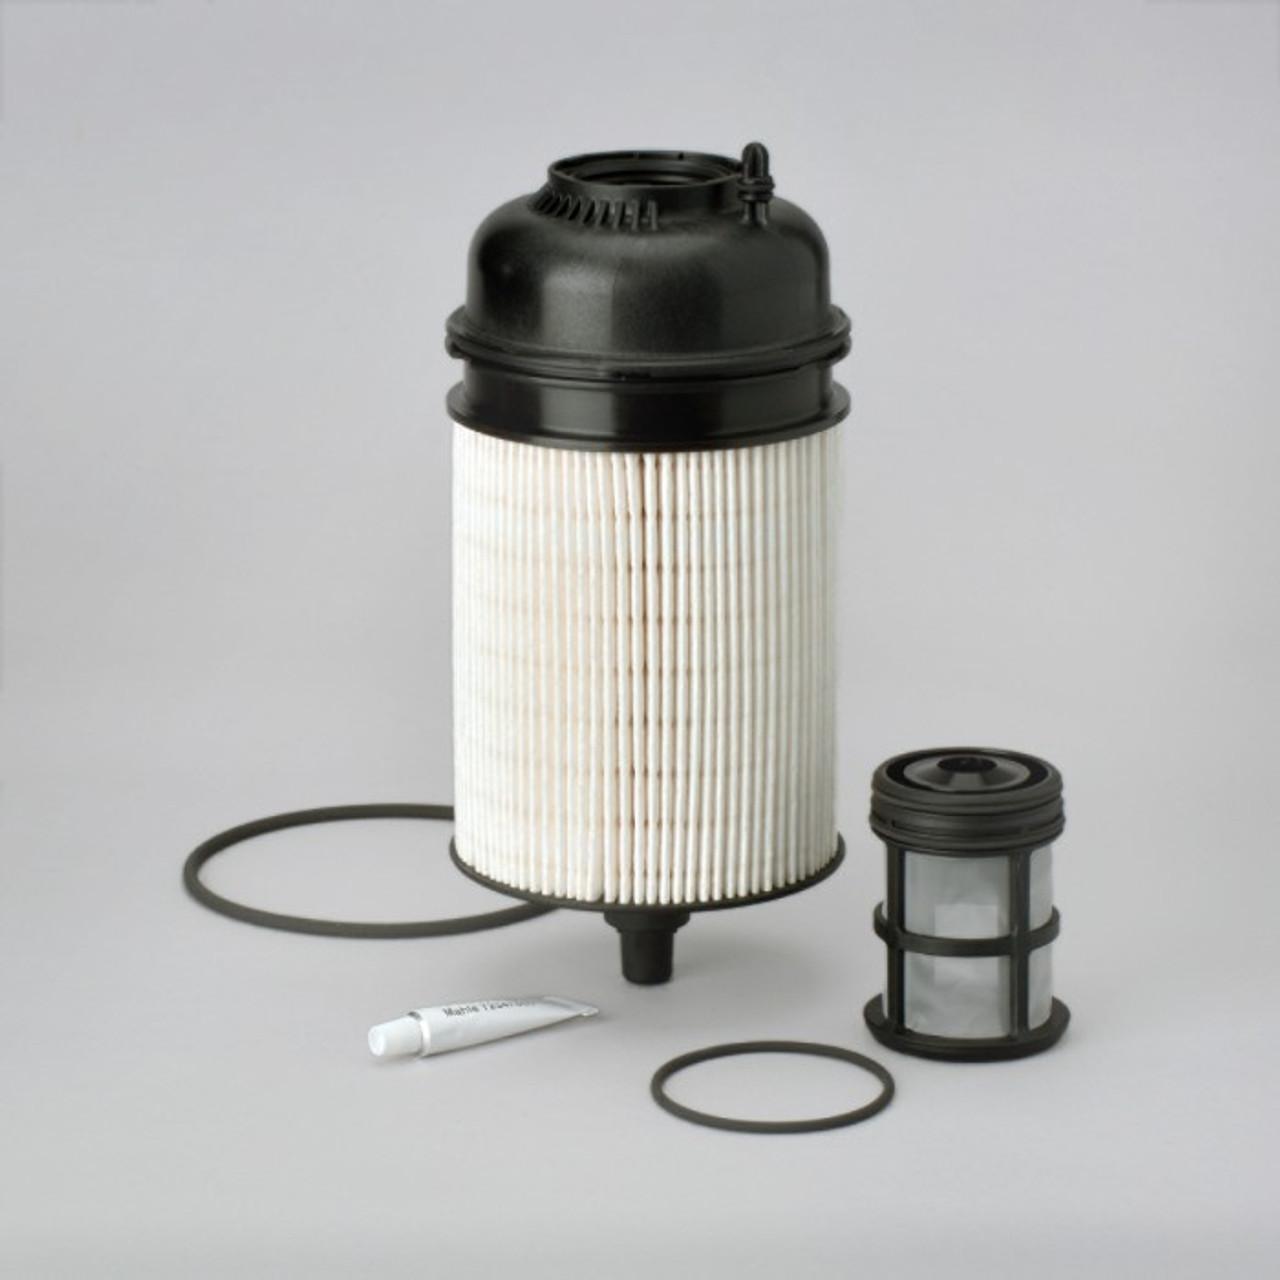 Detroit DD13 /DD15/ DD16 Filter Kit- Oil, FWS & 2 Fuel Filter Kit Donaldson